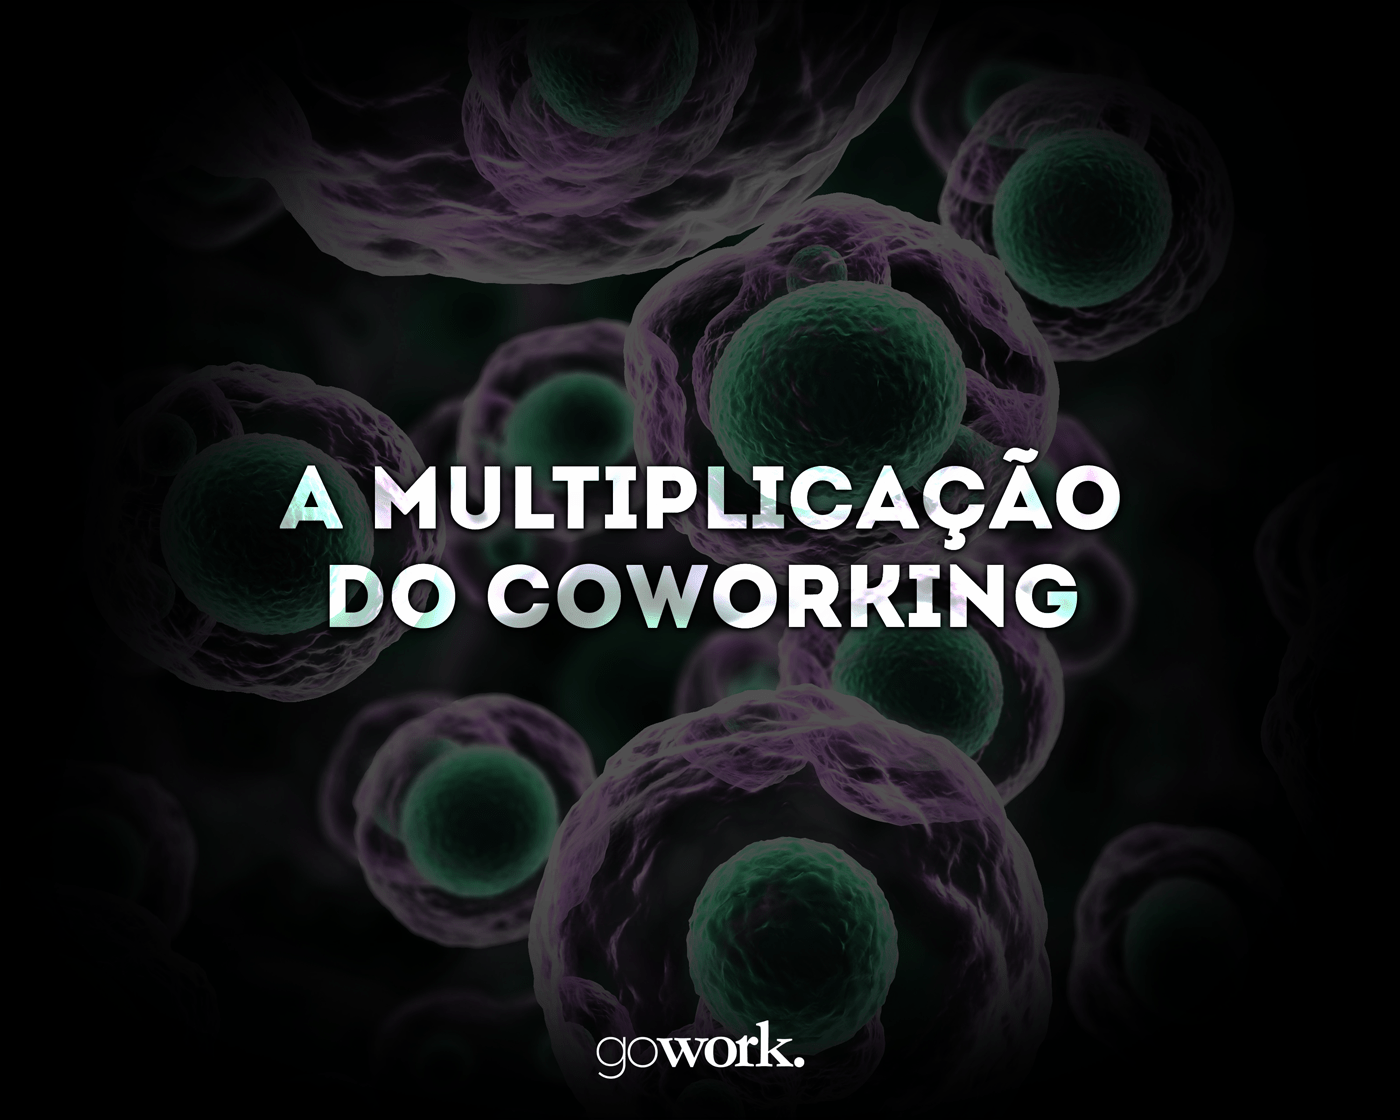 Aumento do número de coworking é constante a anos